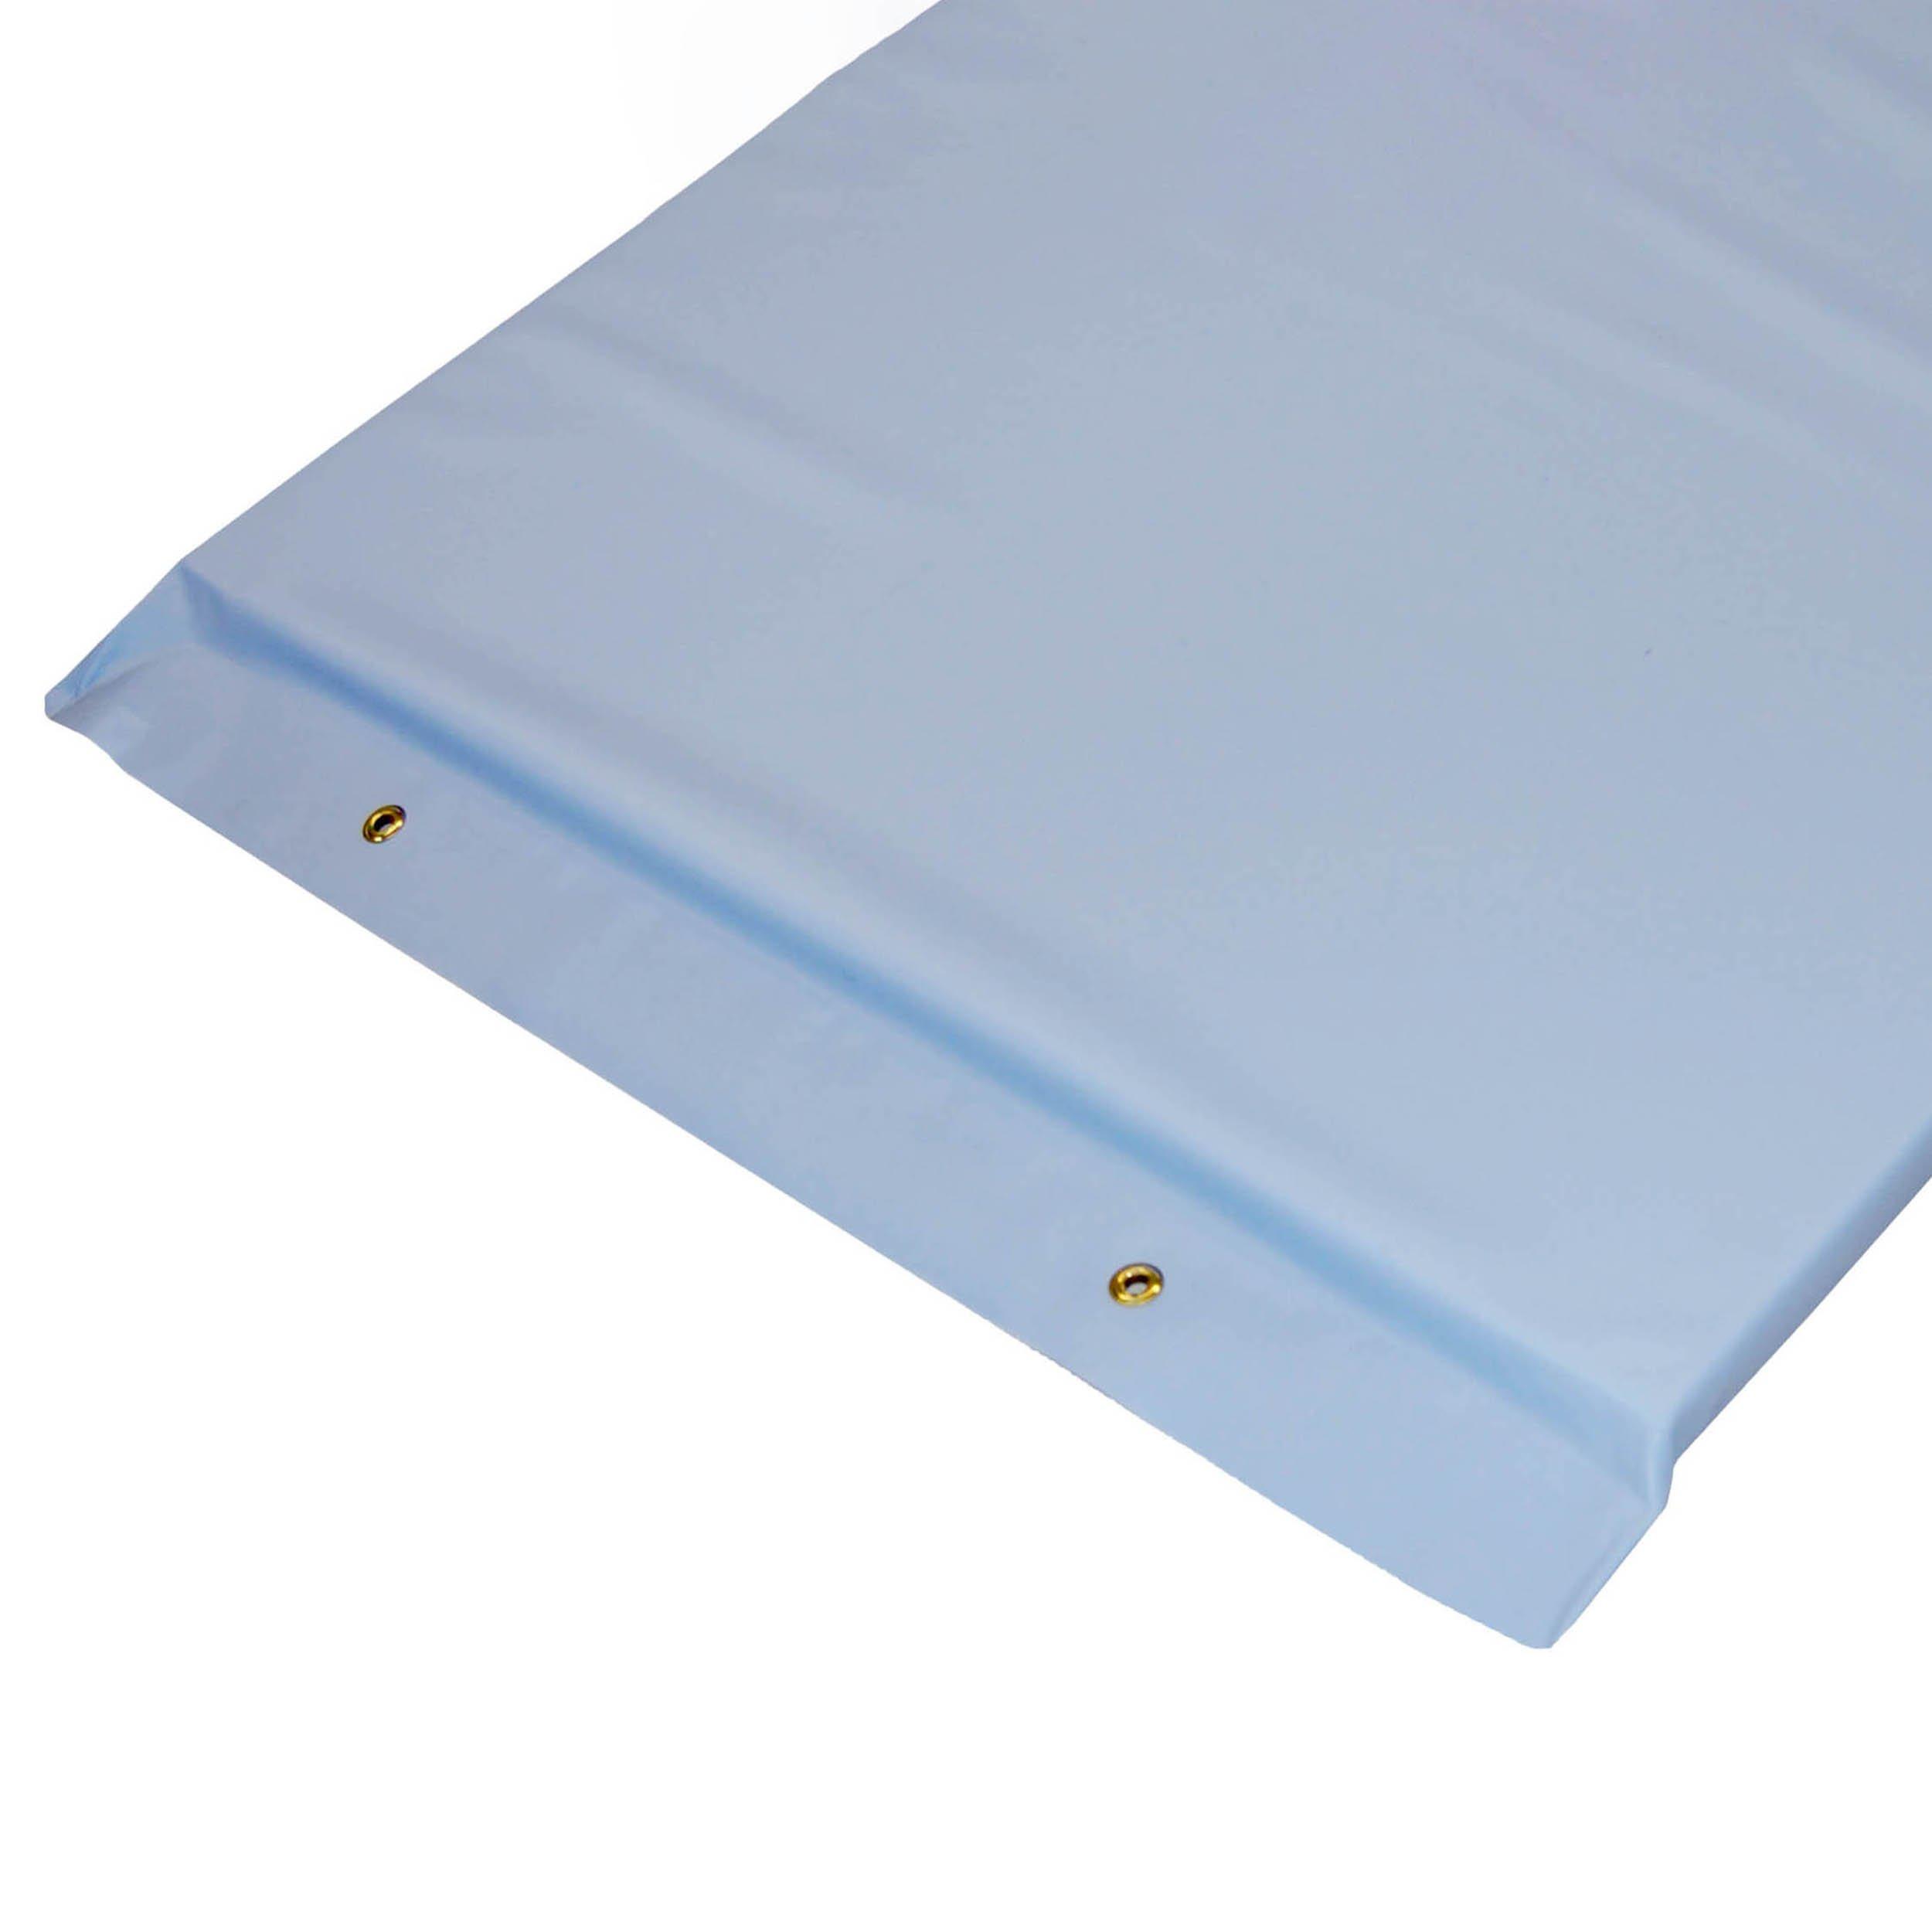 Economy Standard Plus Radiolucent X-Ray Comfort Foam Table Pad - Light Blue Vinyl, With Grommets 80